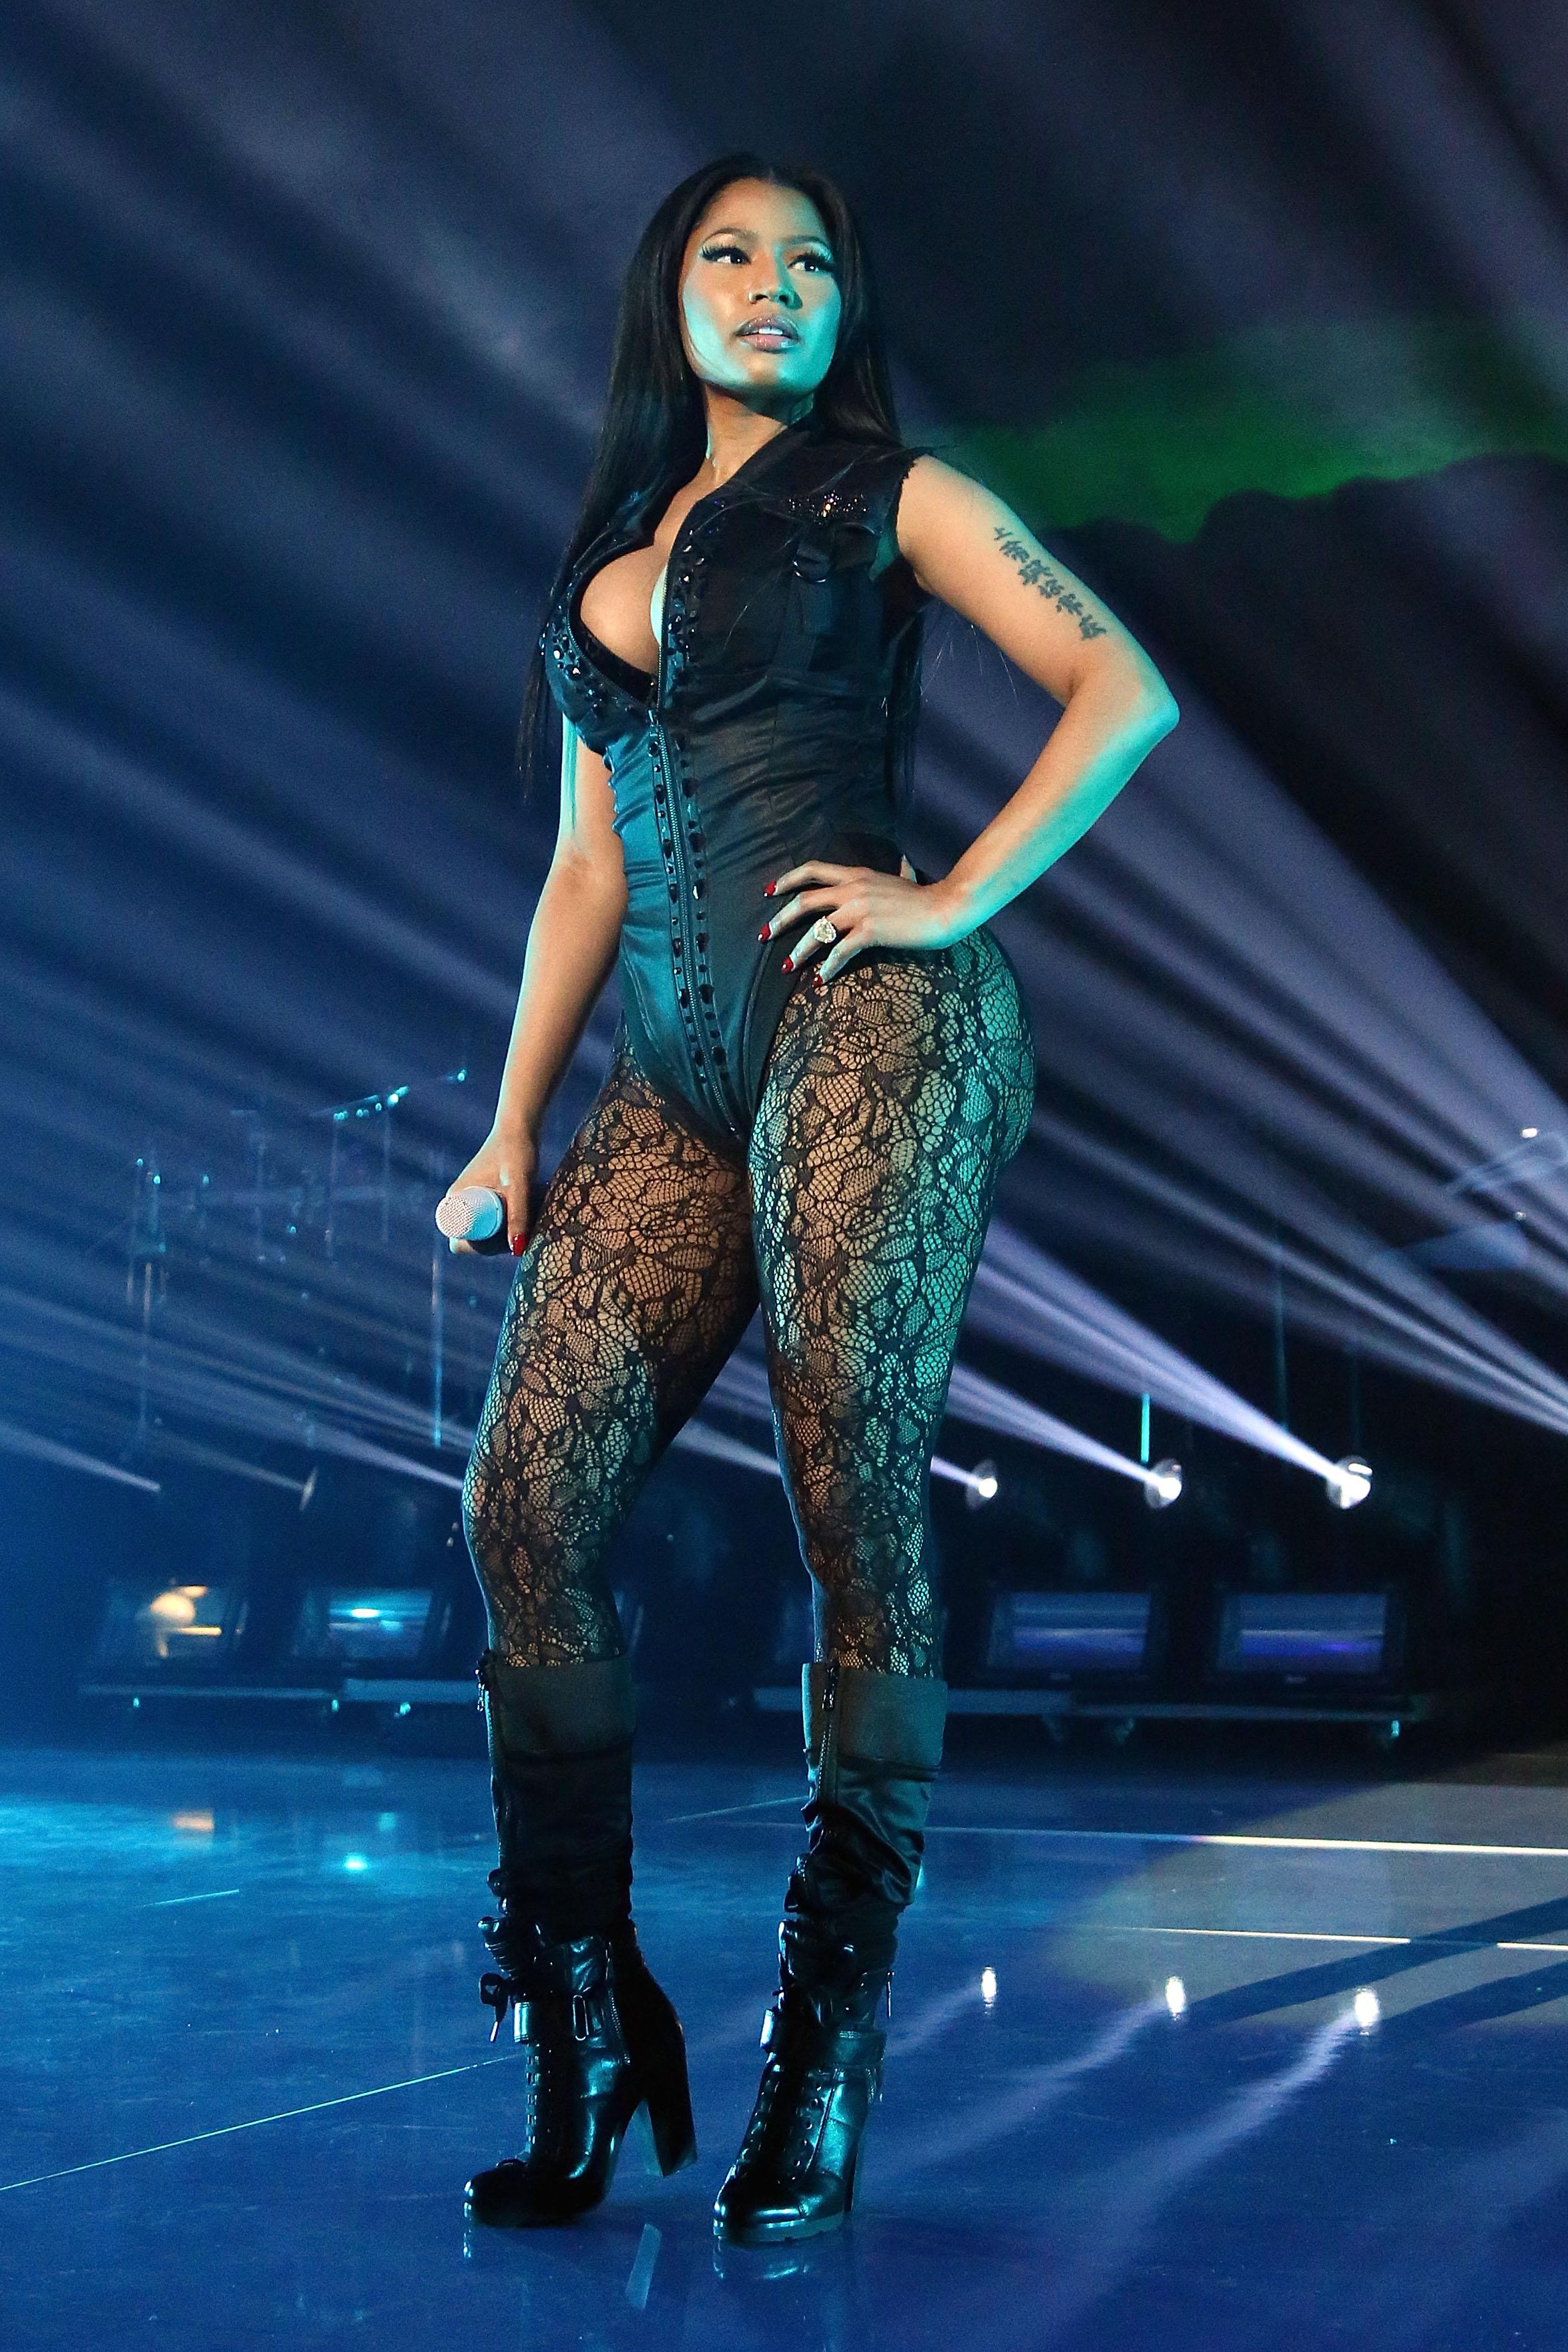 Nicki Minaj Argues Streaming Should Count Toward Album Sales Rolling Stone